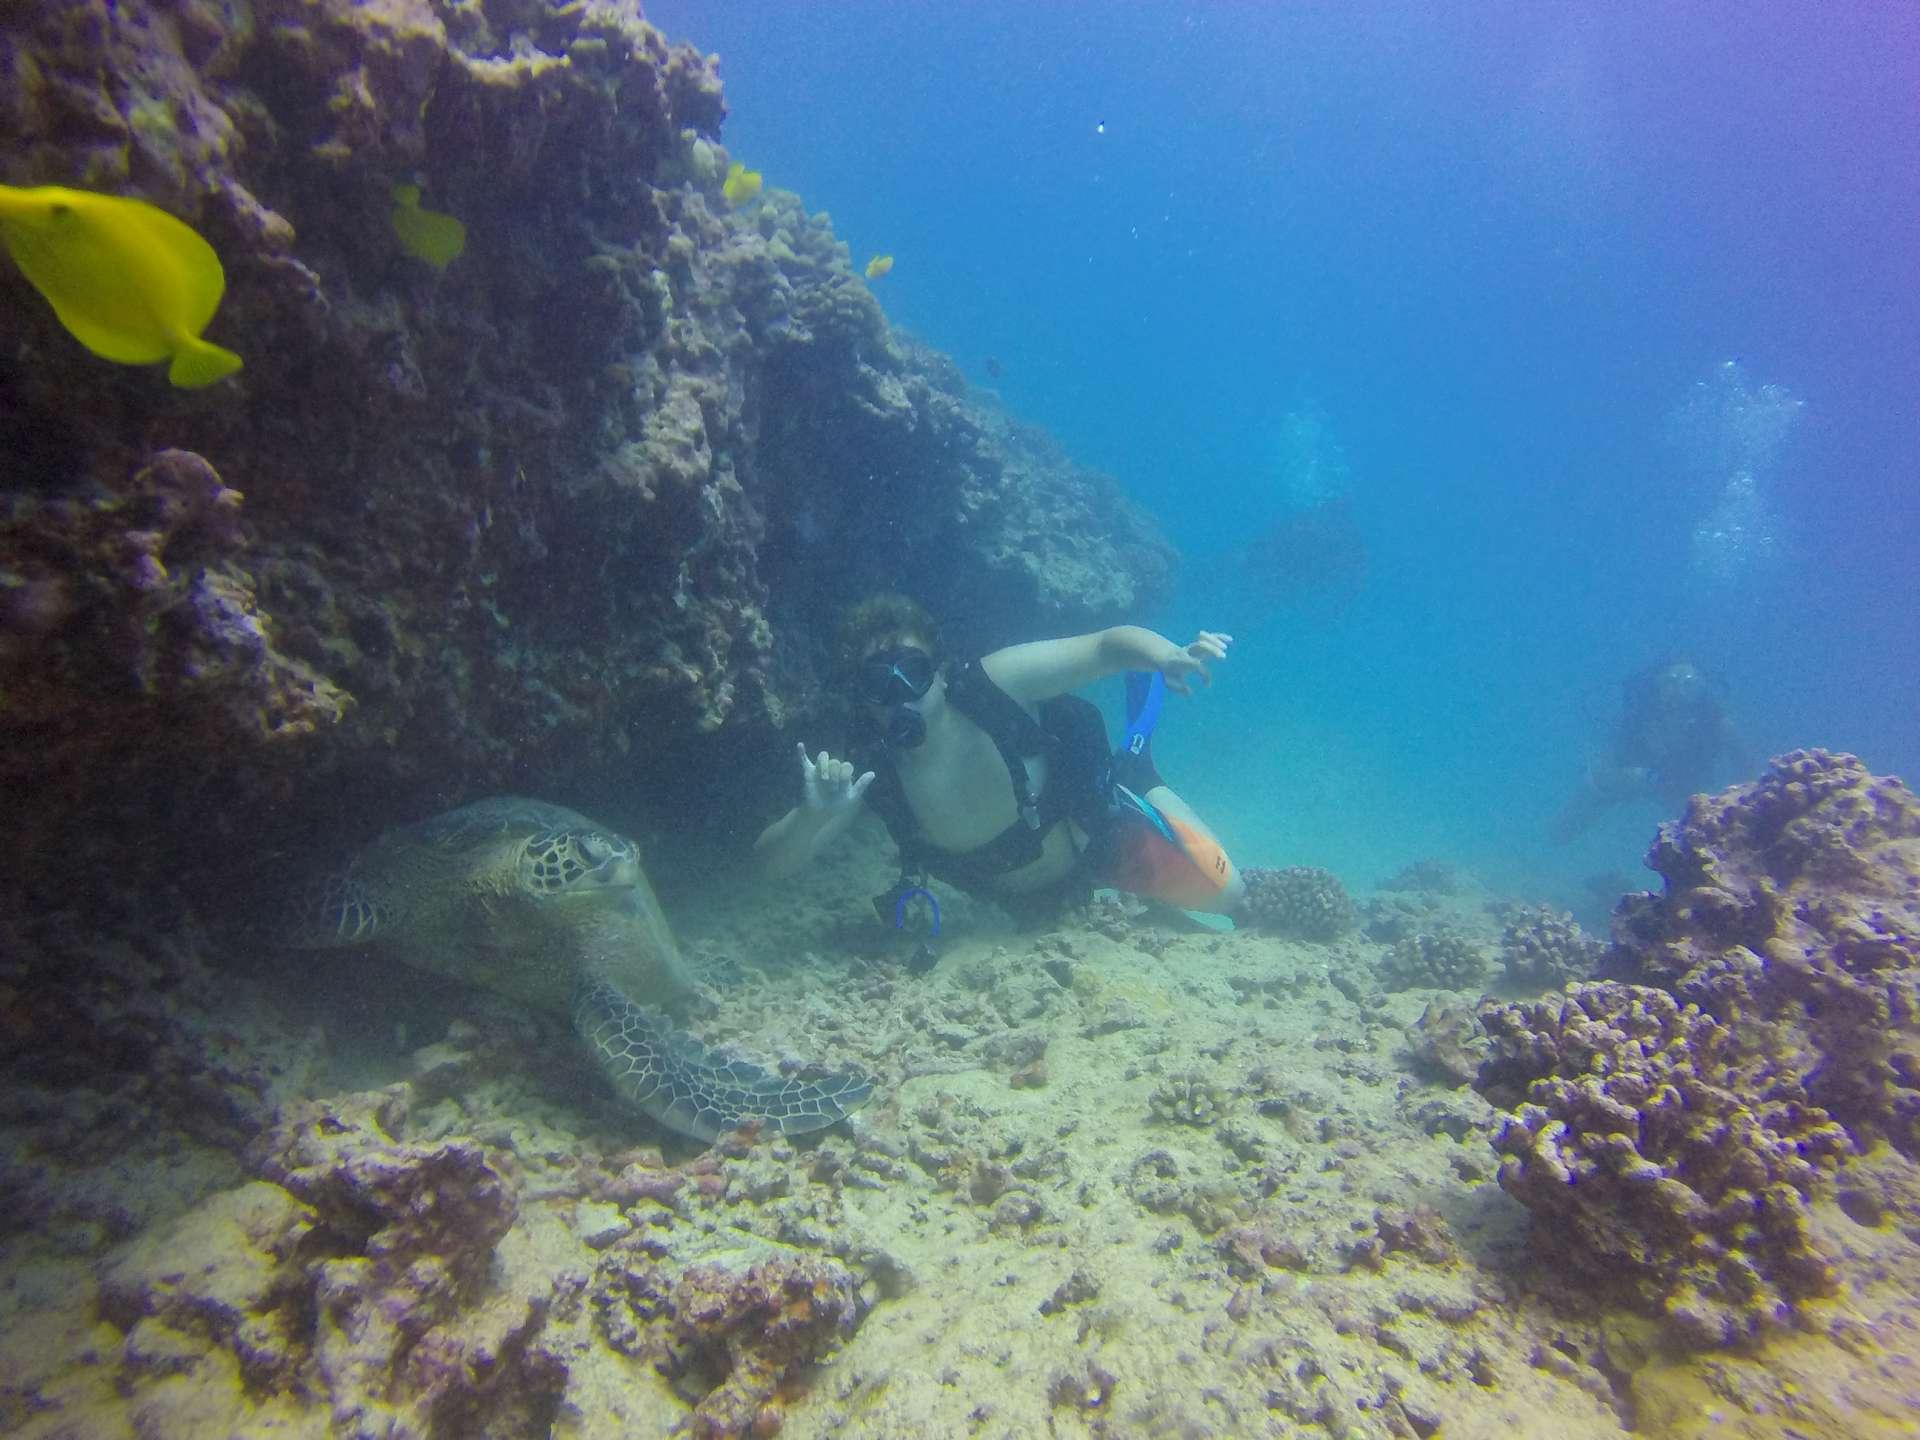 72cm Regulator Necklace Scuba Diving 10cm Double Hose Holder with Clip